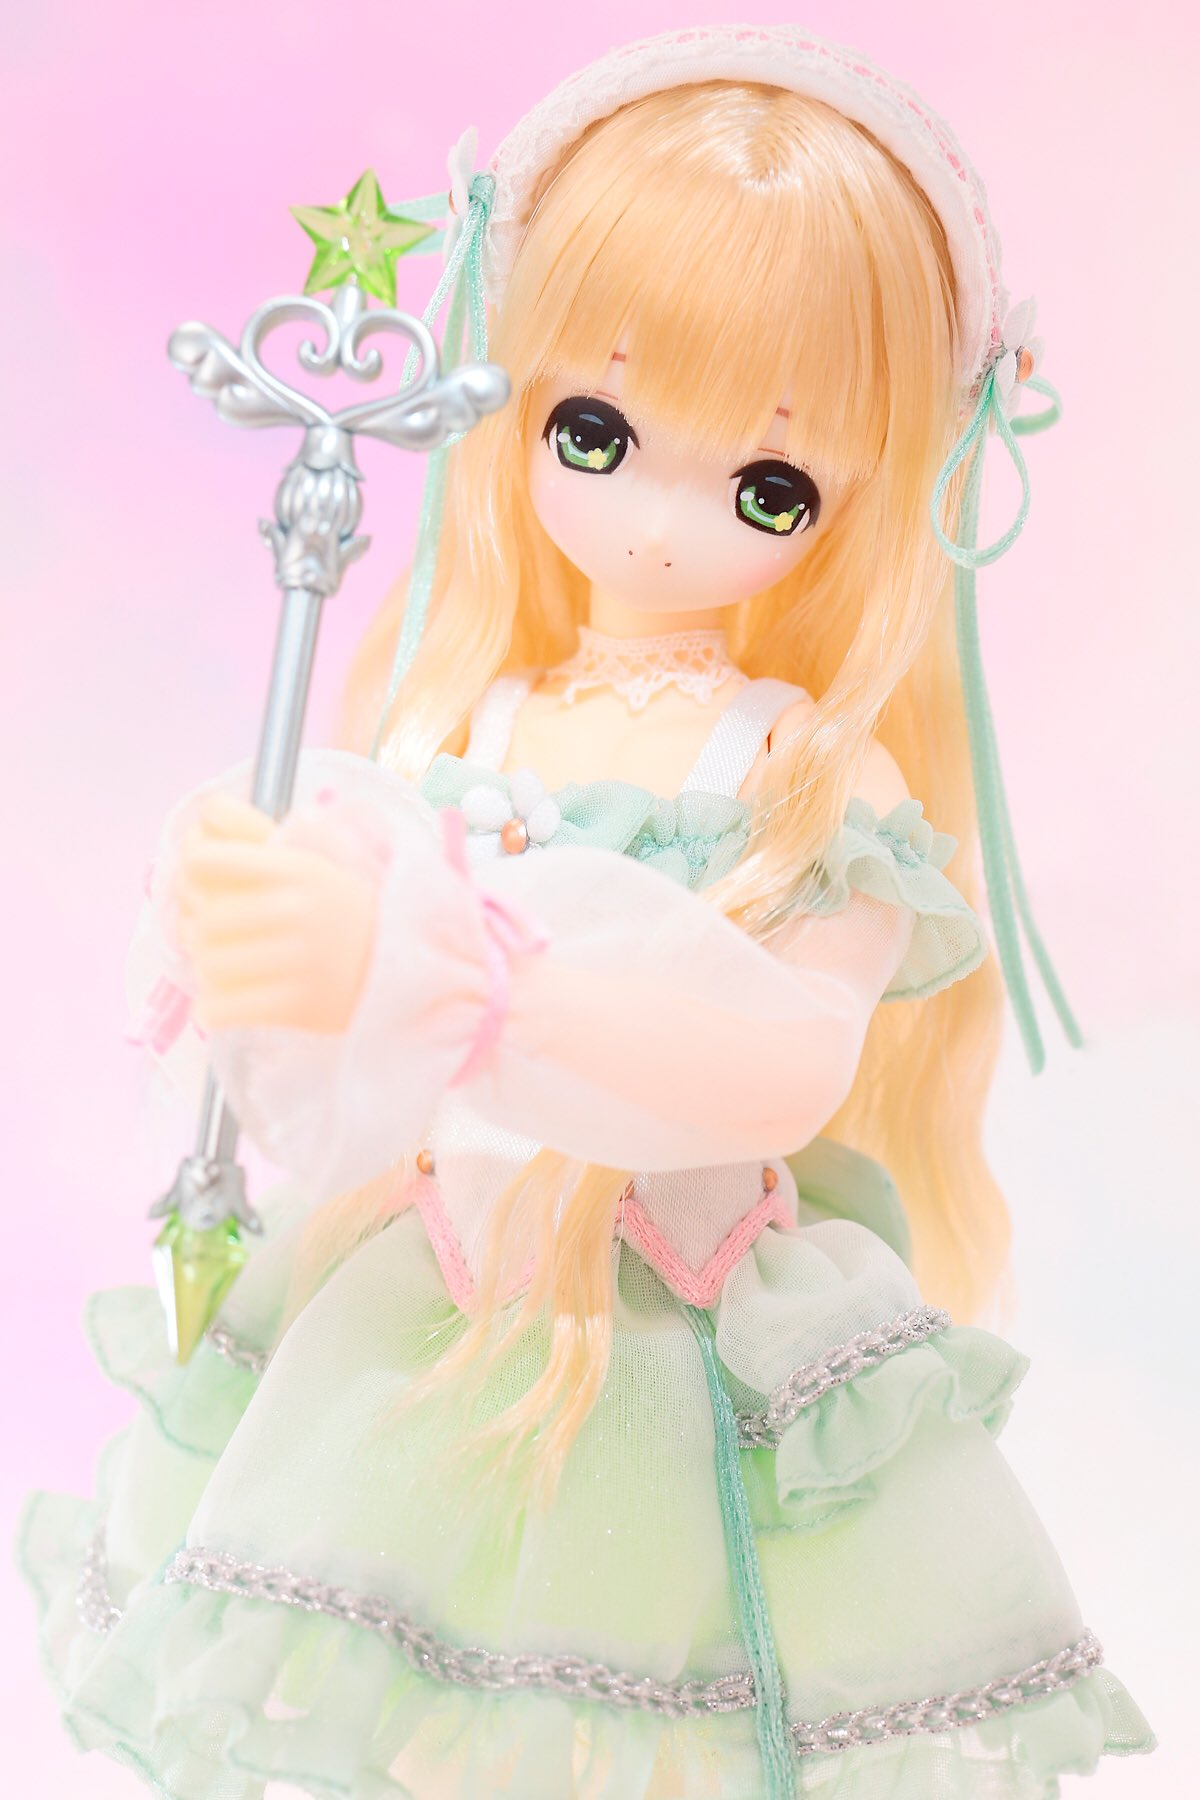 [Pure Neemo] Magical Cute Floral Ease - Miu Eaiaob13